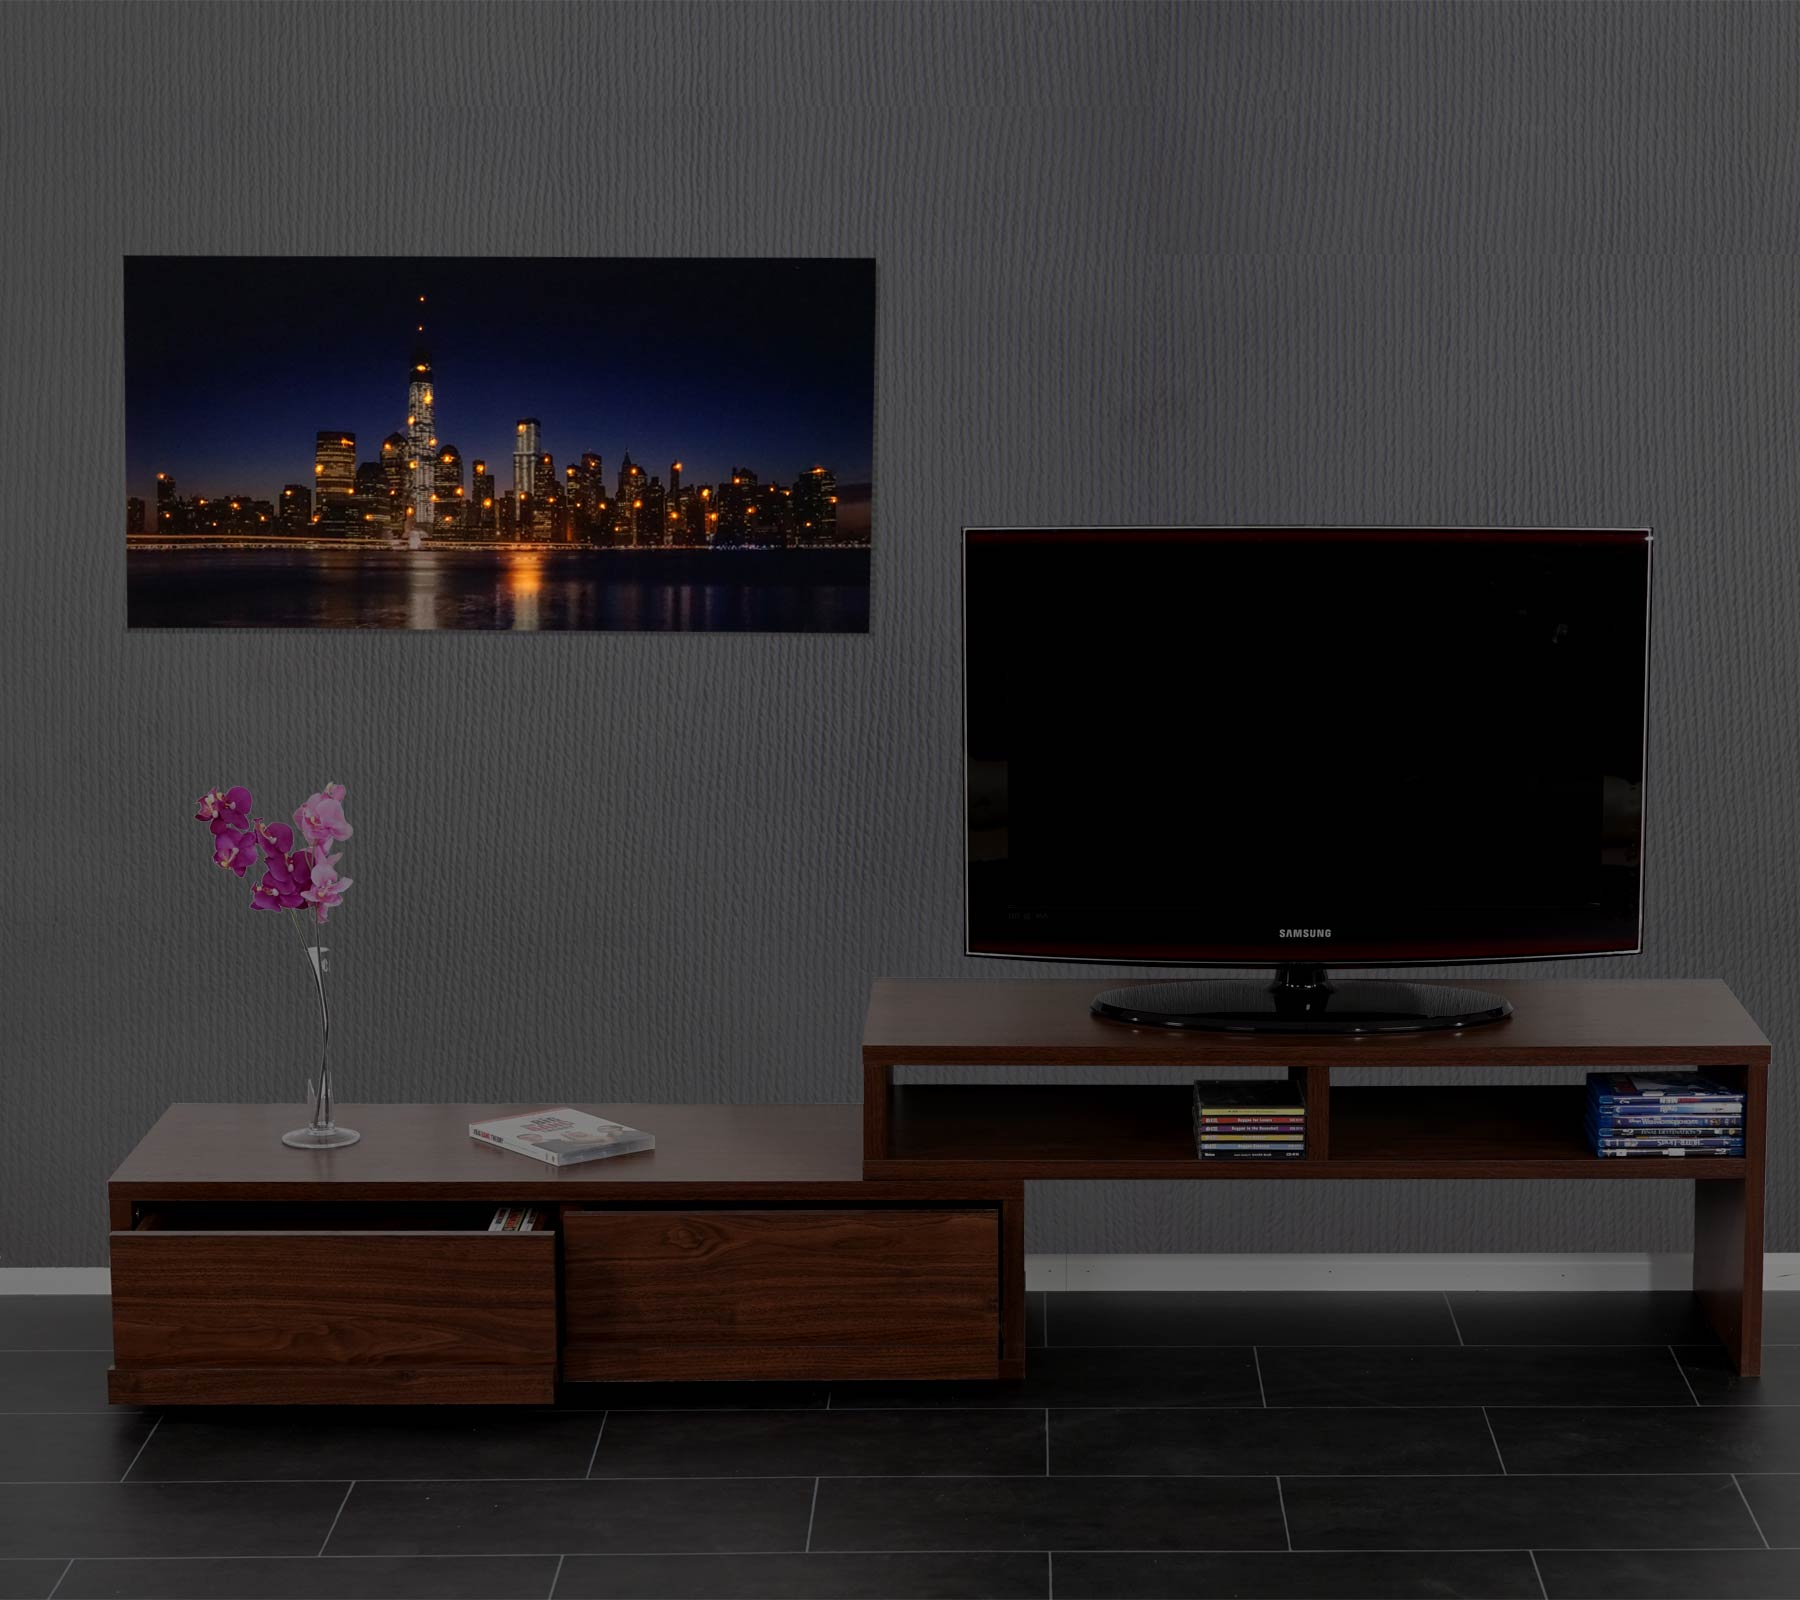 LED-Bild 100x50cm One World Trade Center